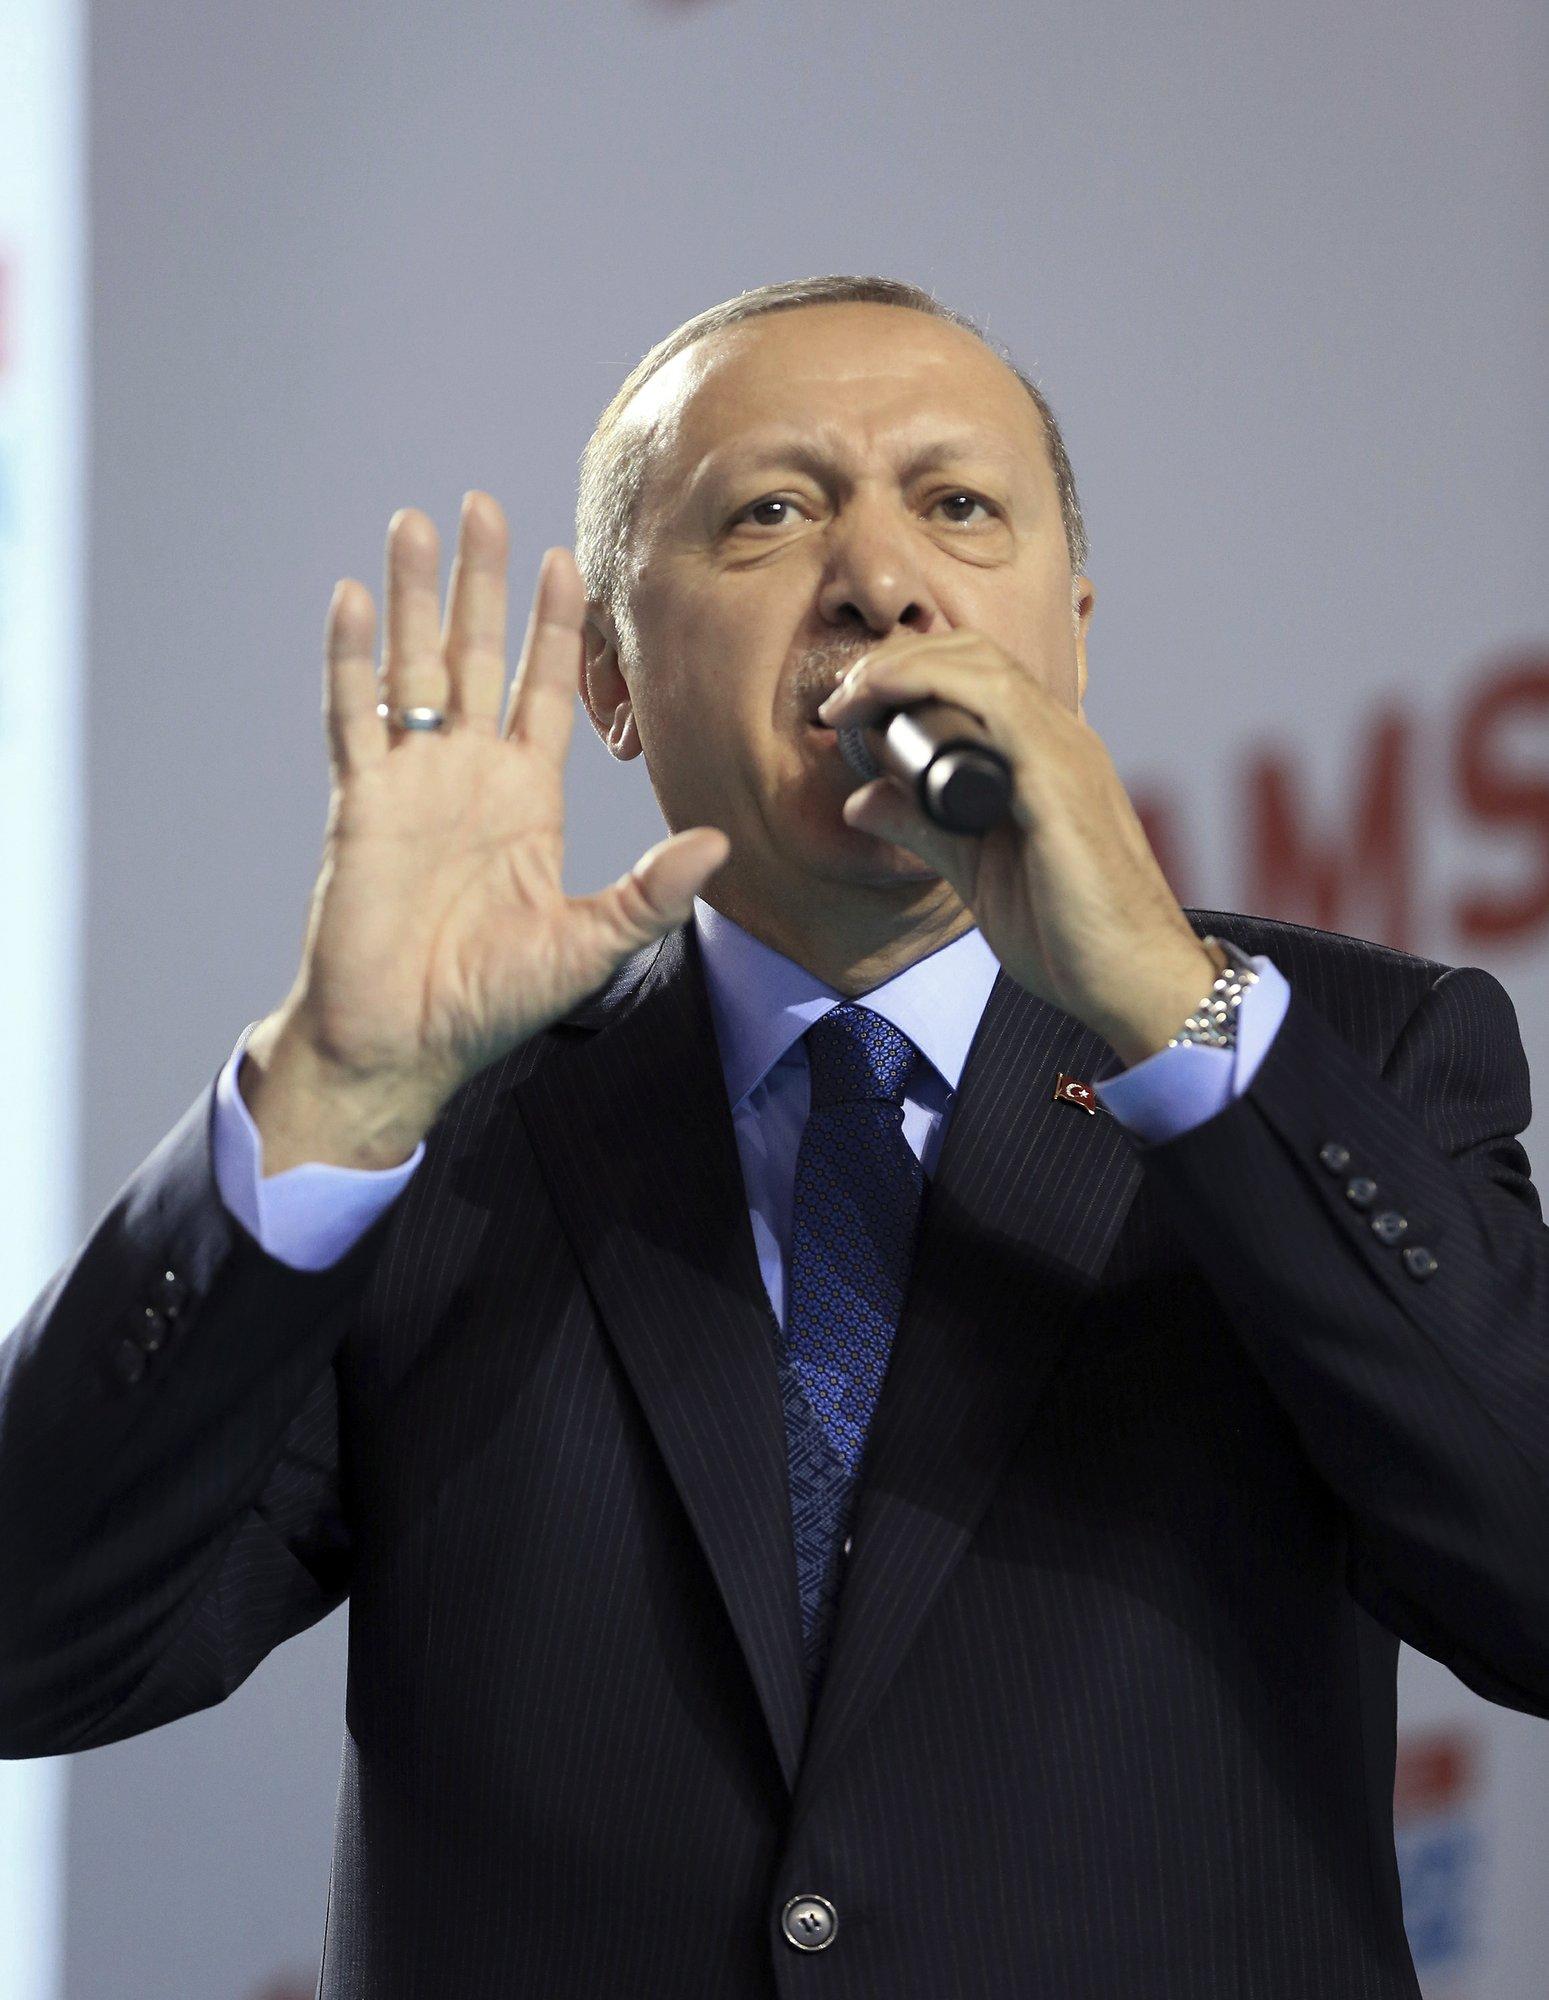 Turkish President Erdogan announced his desire to overthrow Bashar Assad 11/29/2016